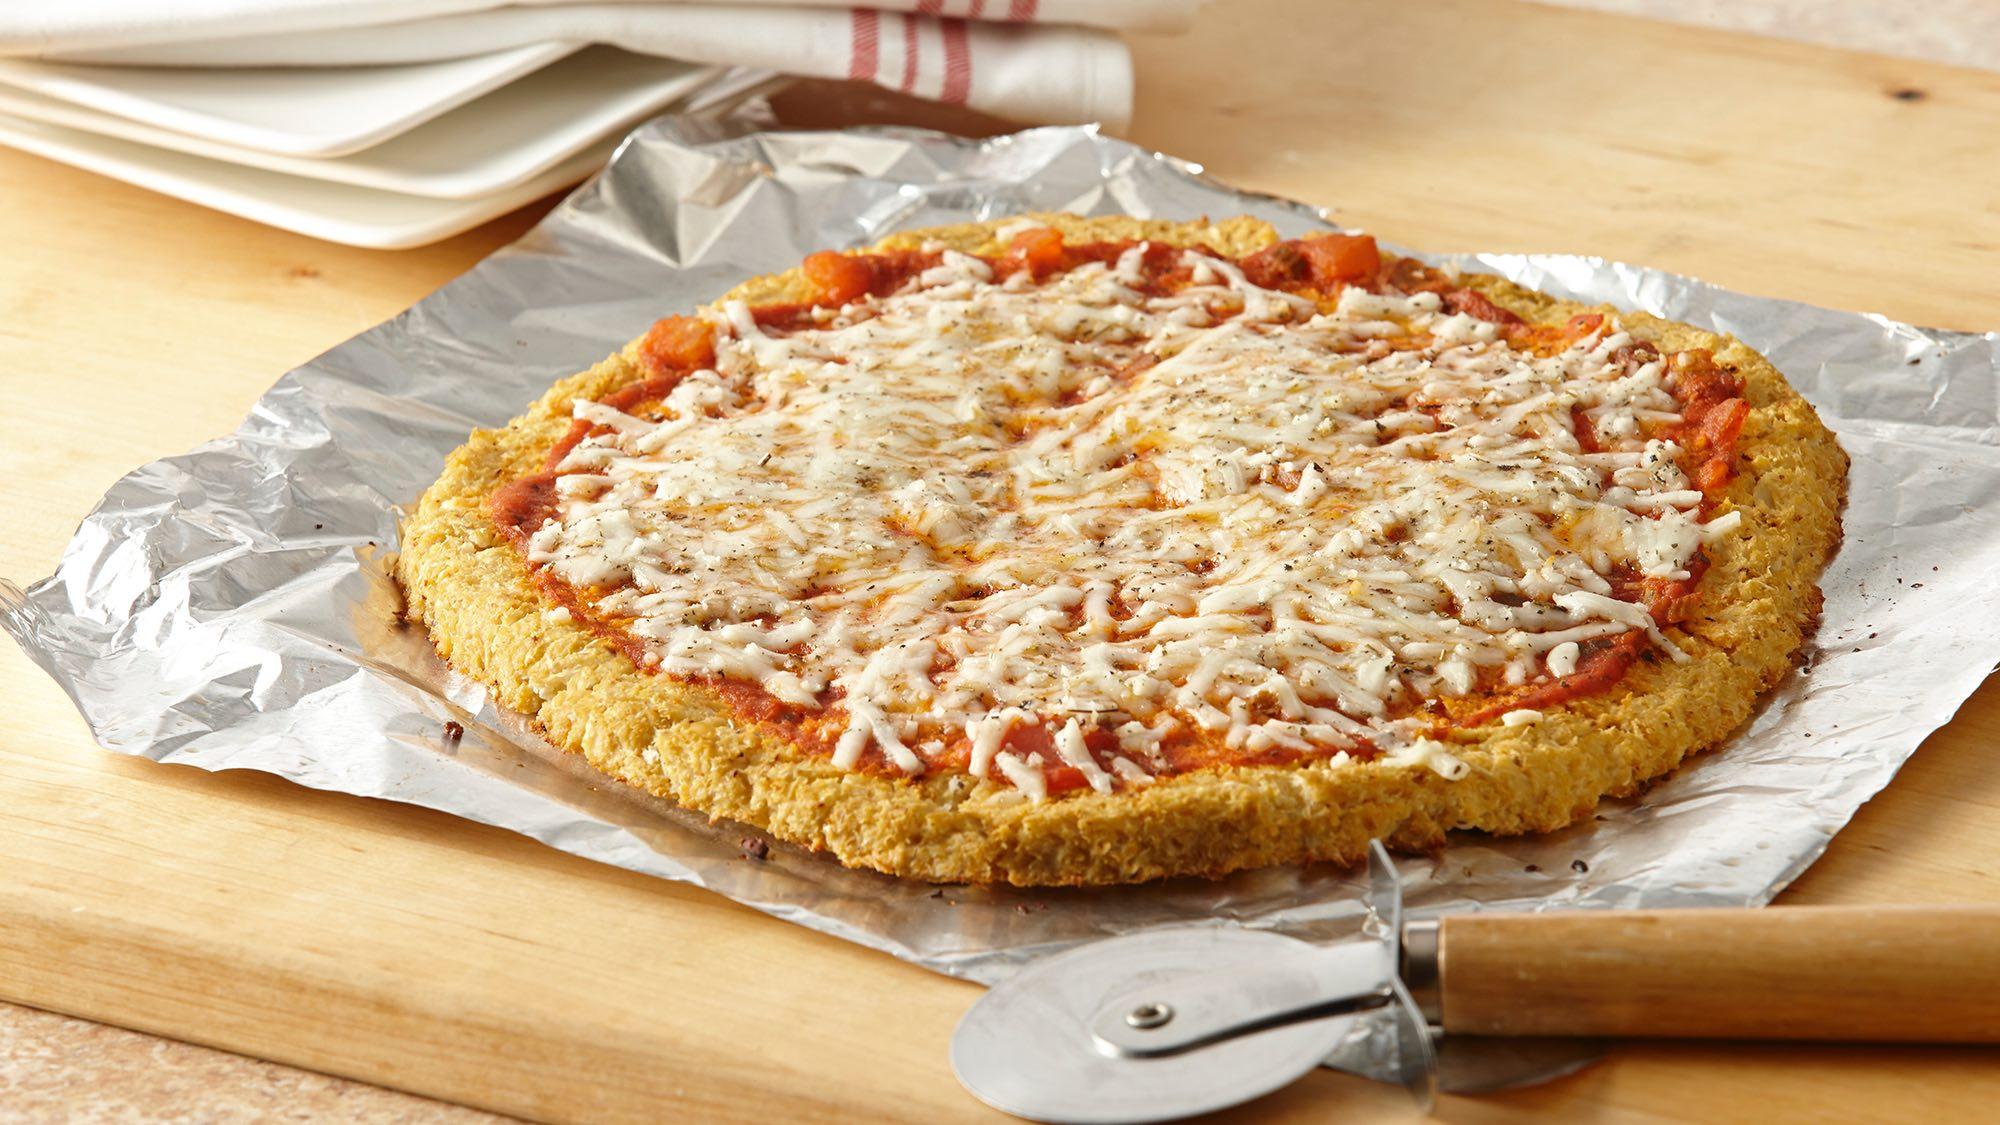 gluten-free-cheese-pizza-with-cauliflower-crust.jpg